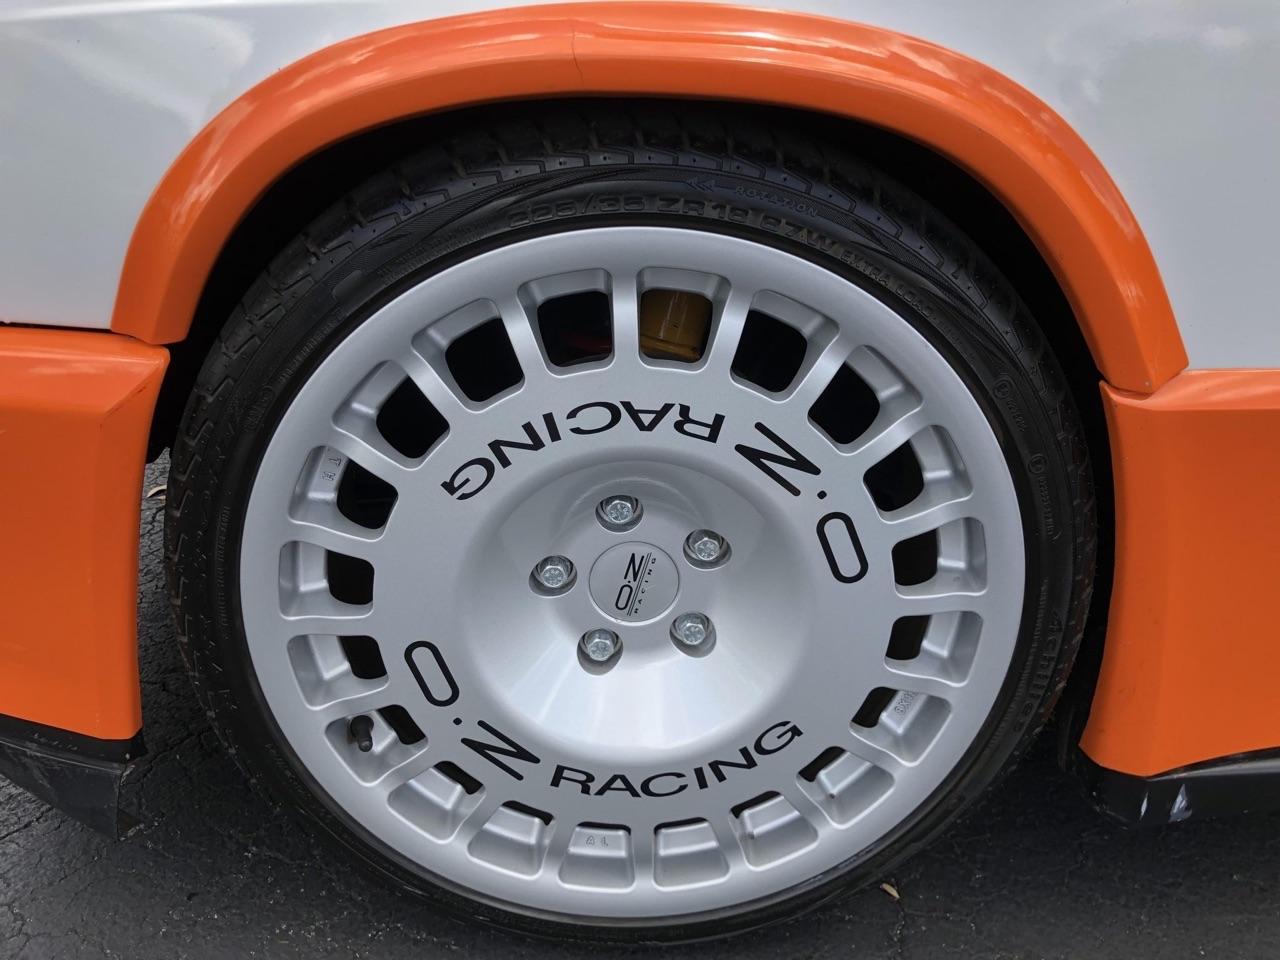 Mercedes 190 3.2 l - Track mode... 5